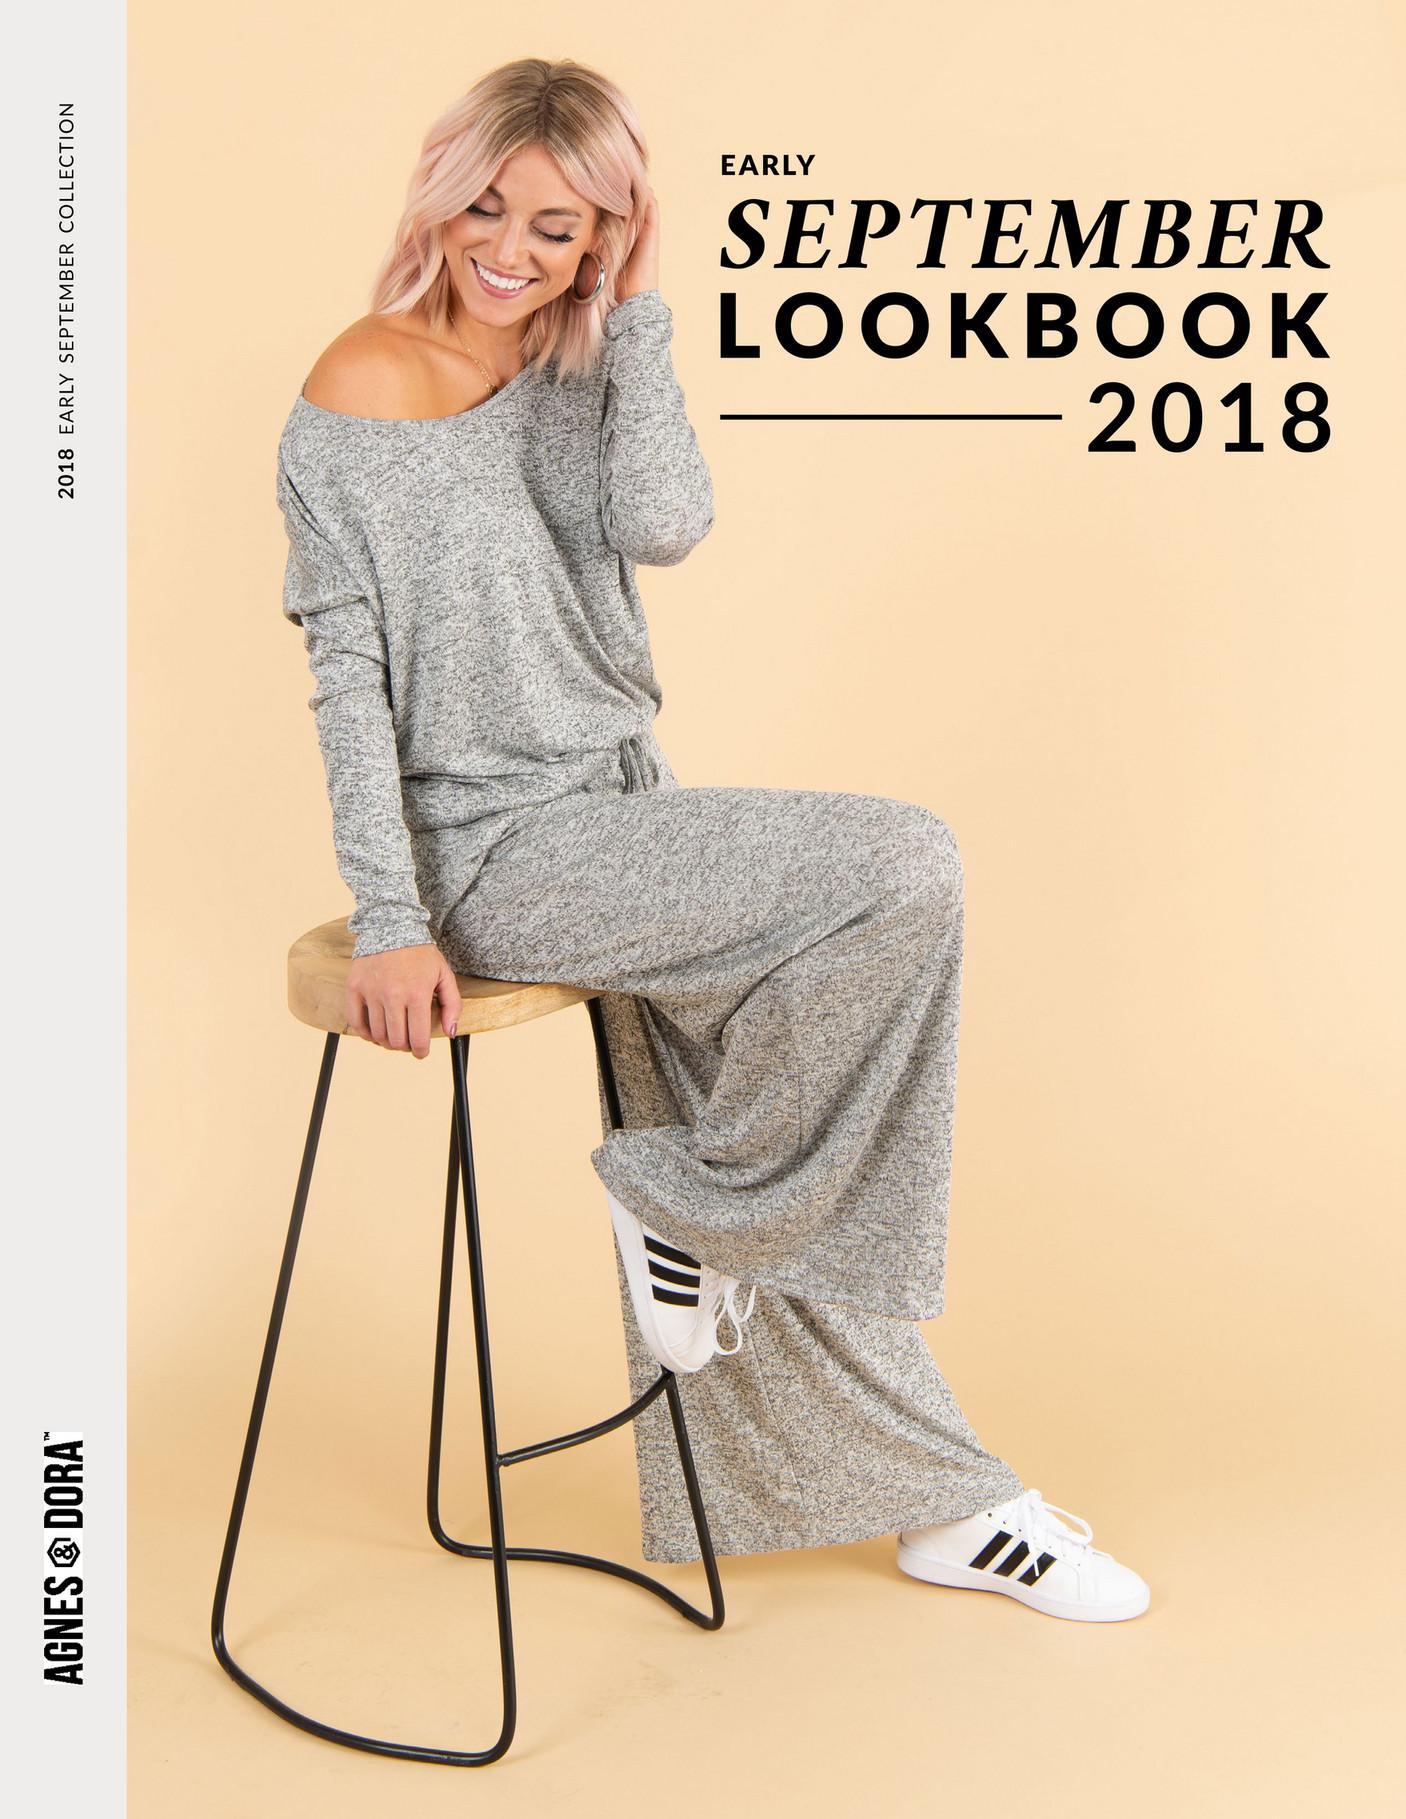 Sensational Agnes Dora 2018 09 Early September Lookbook Page 1 Gamerscity Chair Design For Home Gamerscityorg